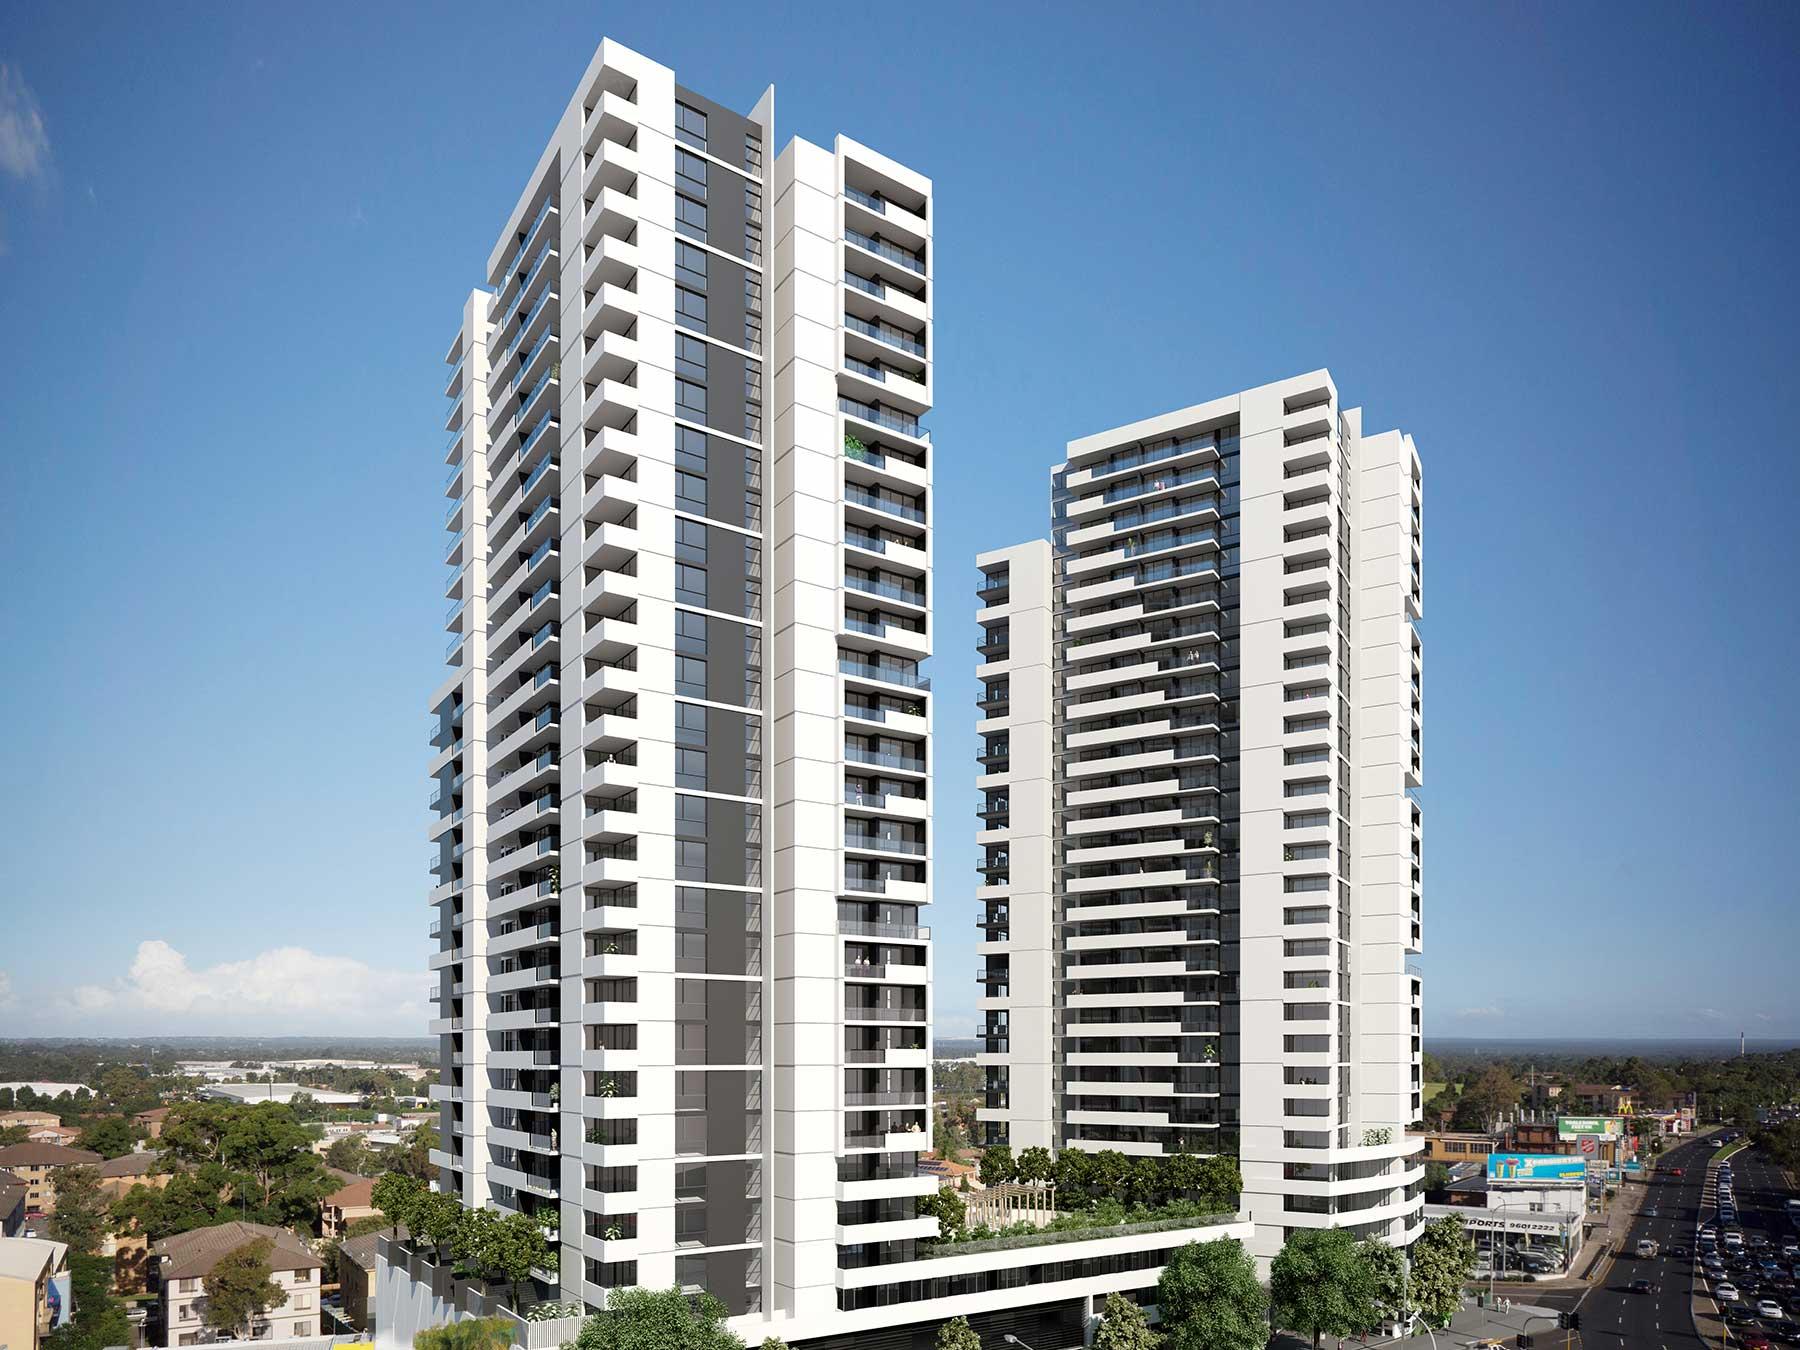 www.skyhaus.com.au